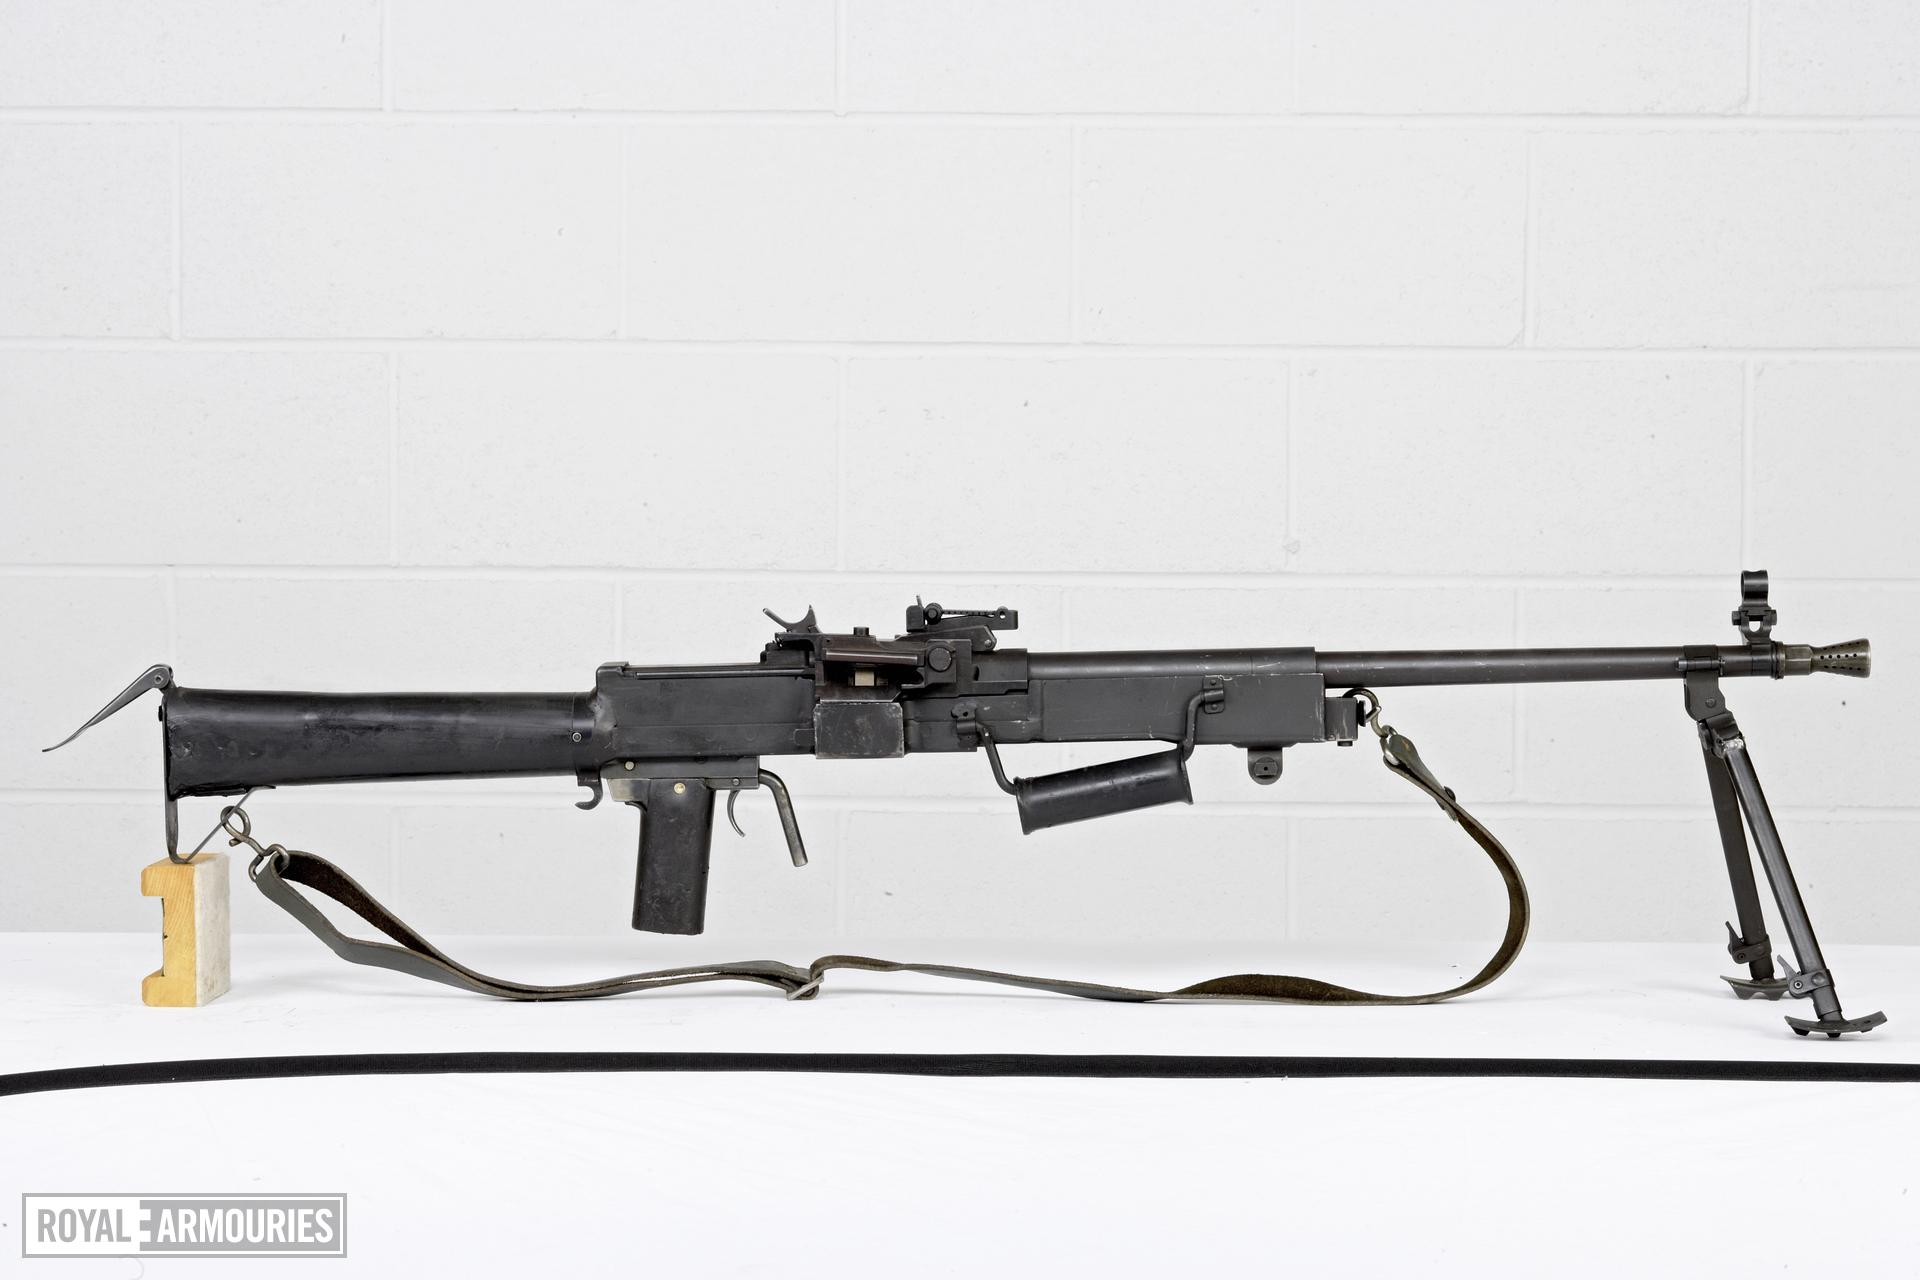 Centrefire automatic light machine gun - Valmet Model 60 Type B